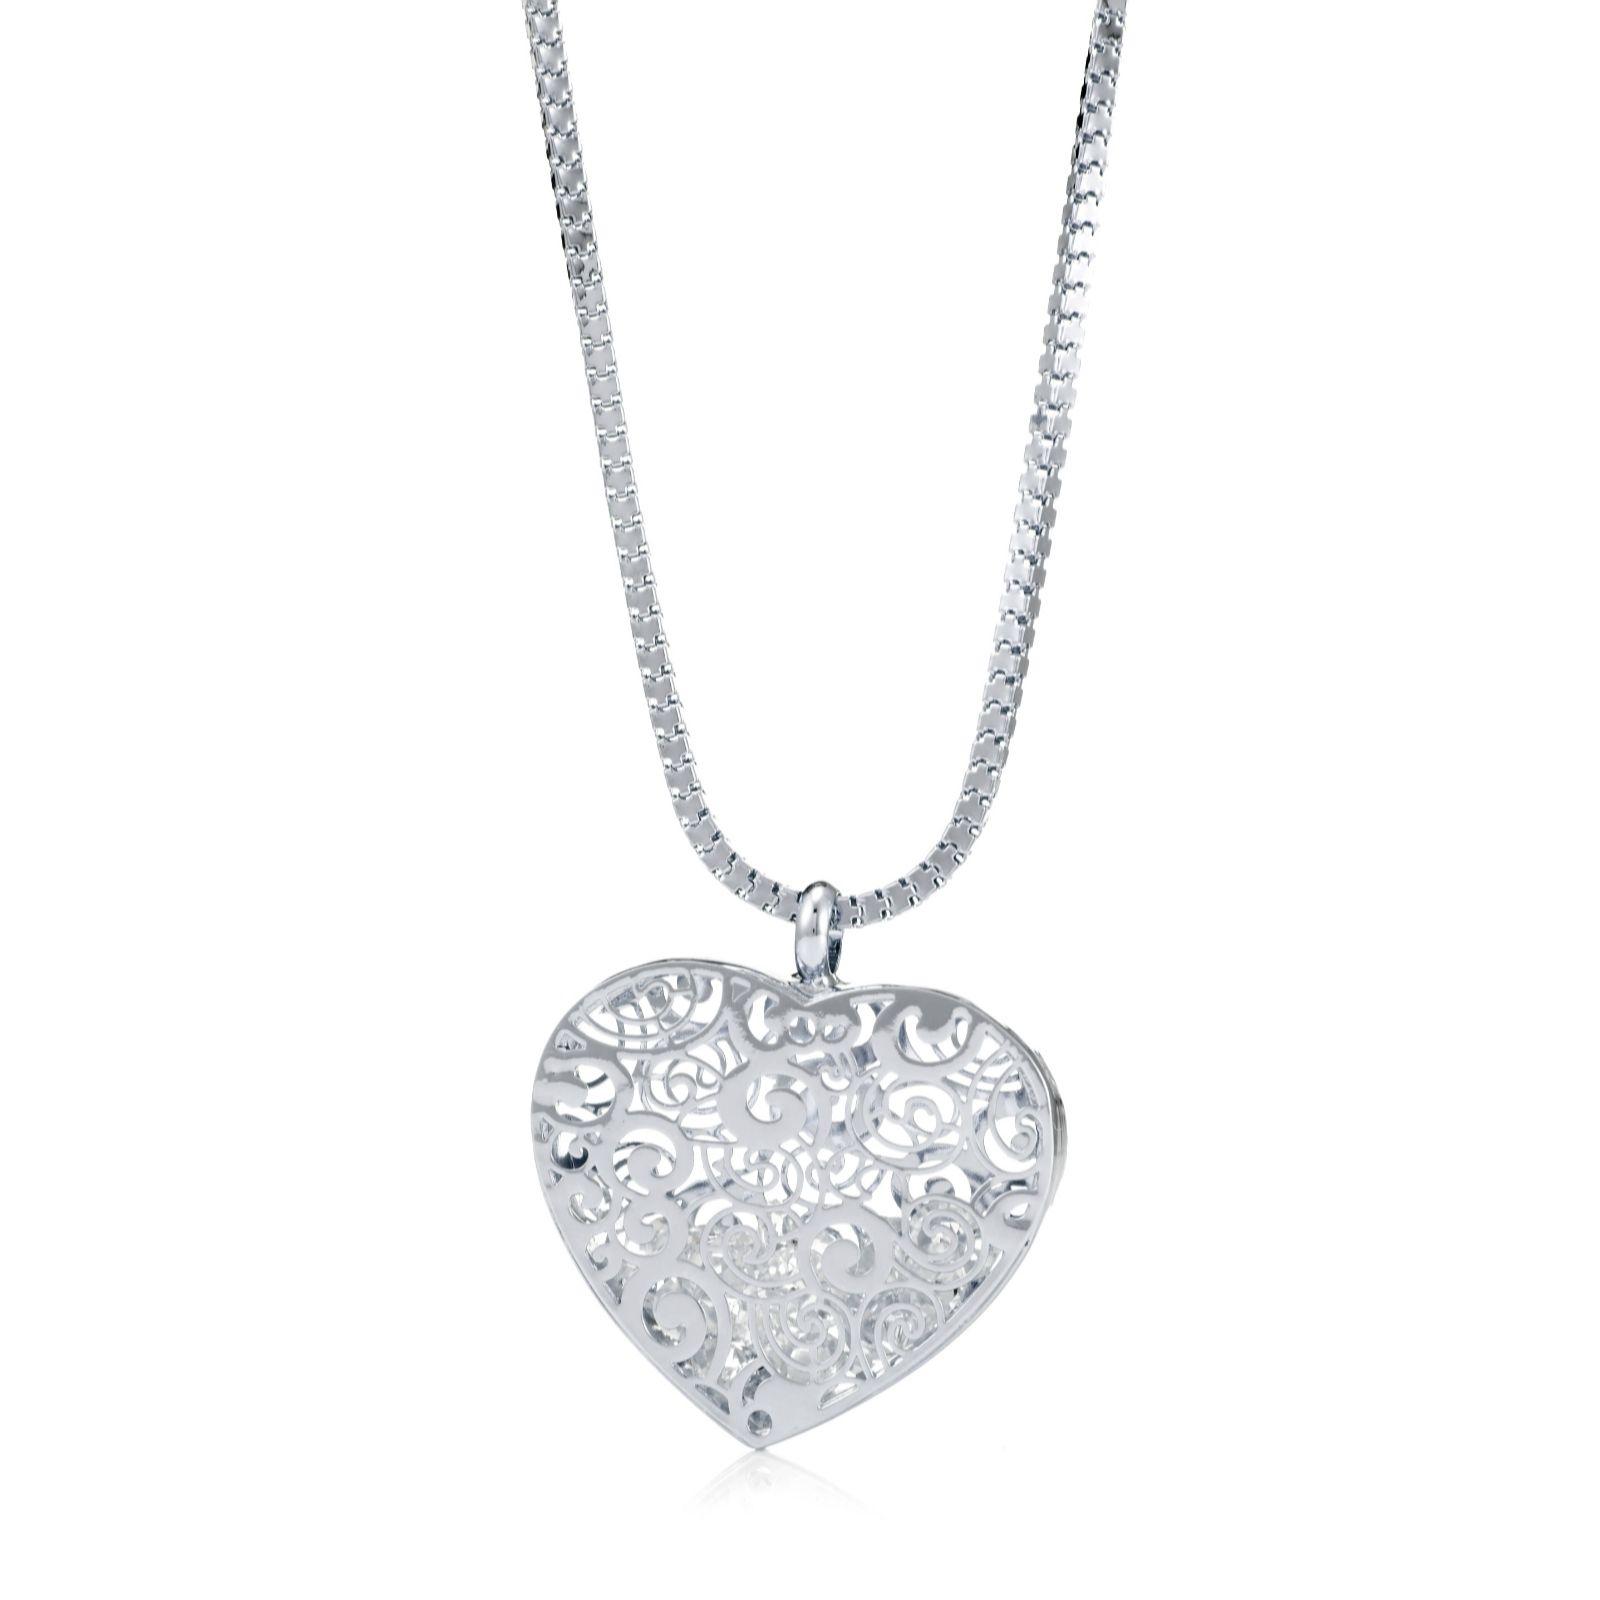 06ec888fd0780b Frank Usher Encapsulated Crystal Heart 80cm Necklace - QVC UK